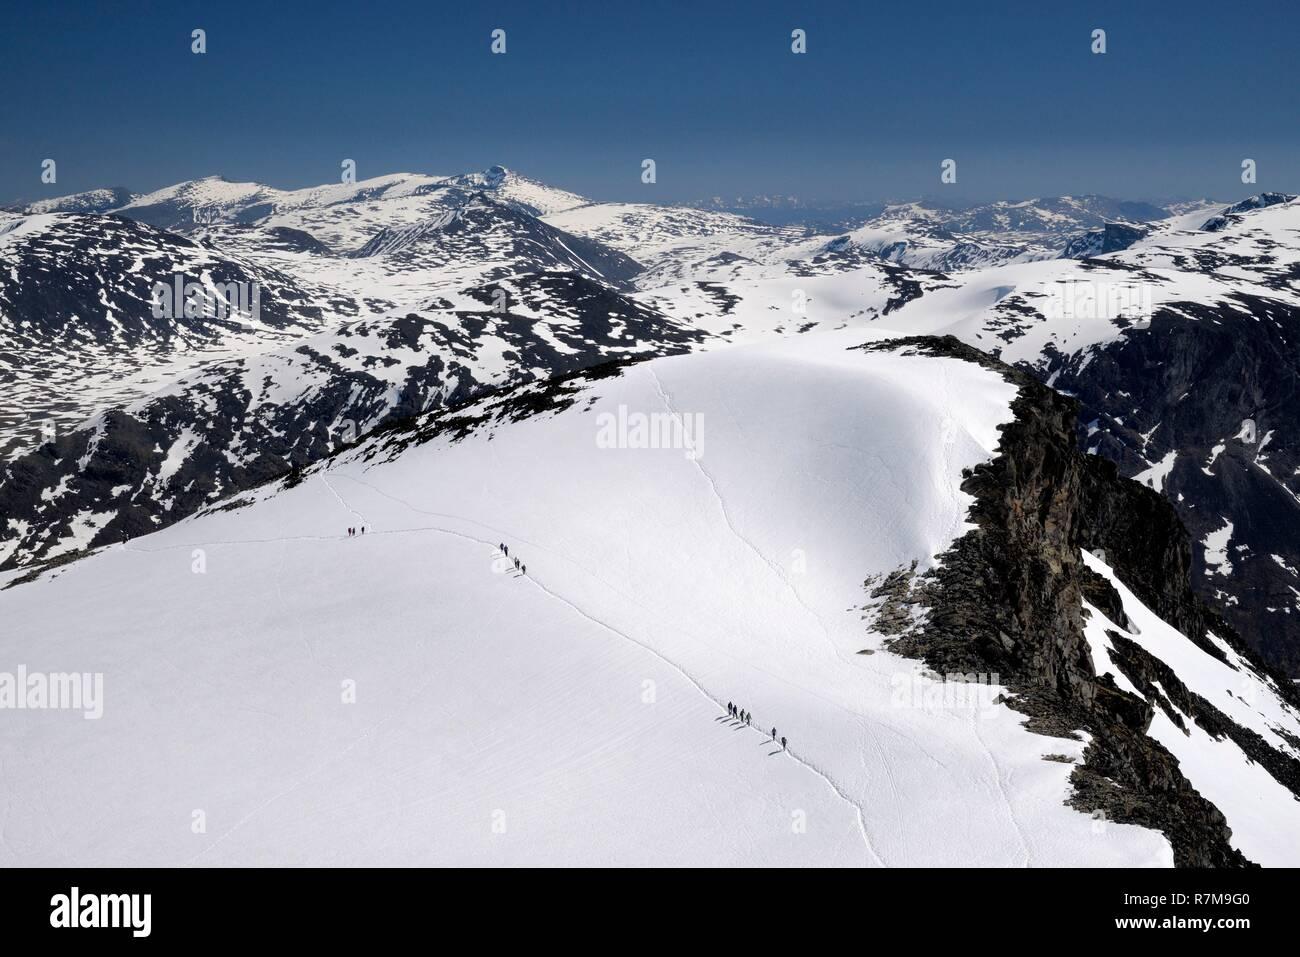 Norway, Oppland, Vaga, Jotunheimen National Park, trekkers climbing Galdhopiggen, the tallest mountain in Norway and Scandinavia at 2469m Stock Photo